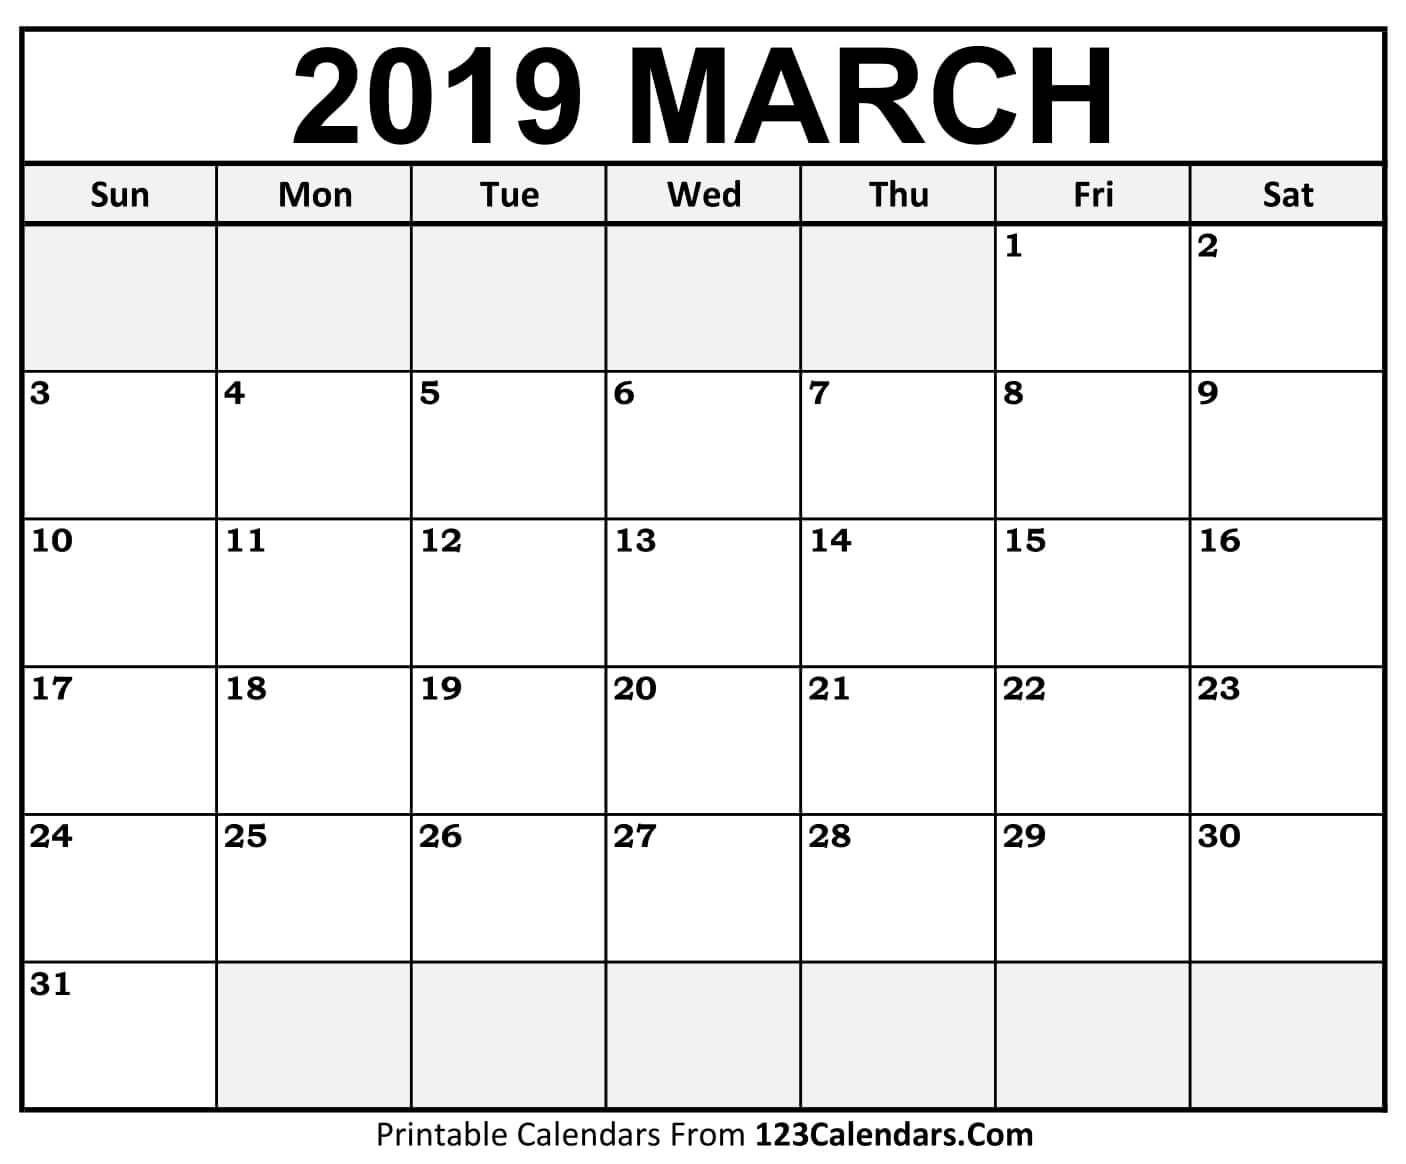 March 2019 Printable Calendar   Free March 2019 Calendar Printable with Calendar Printable Free Template